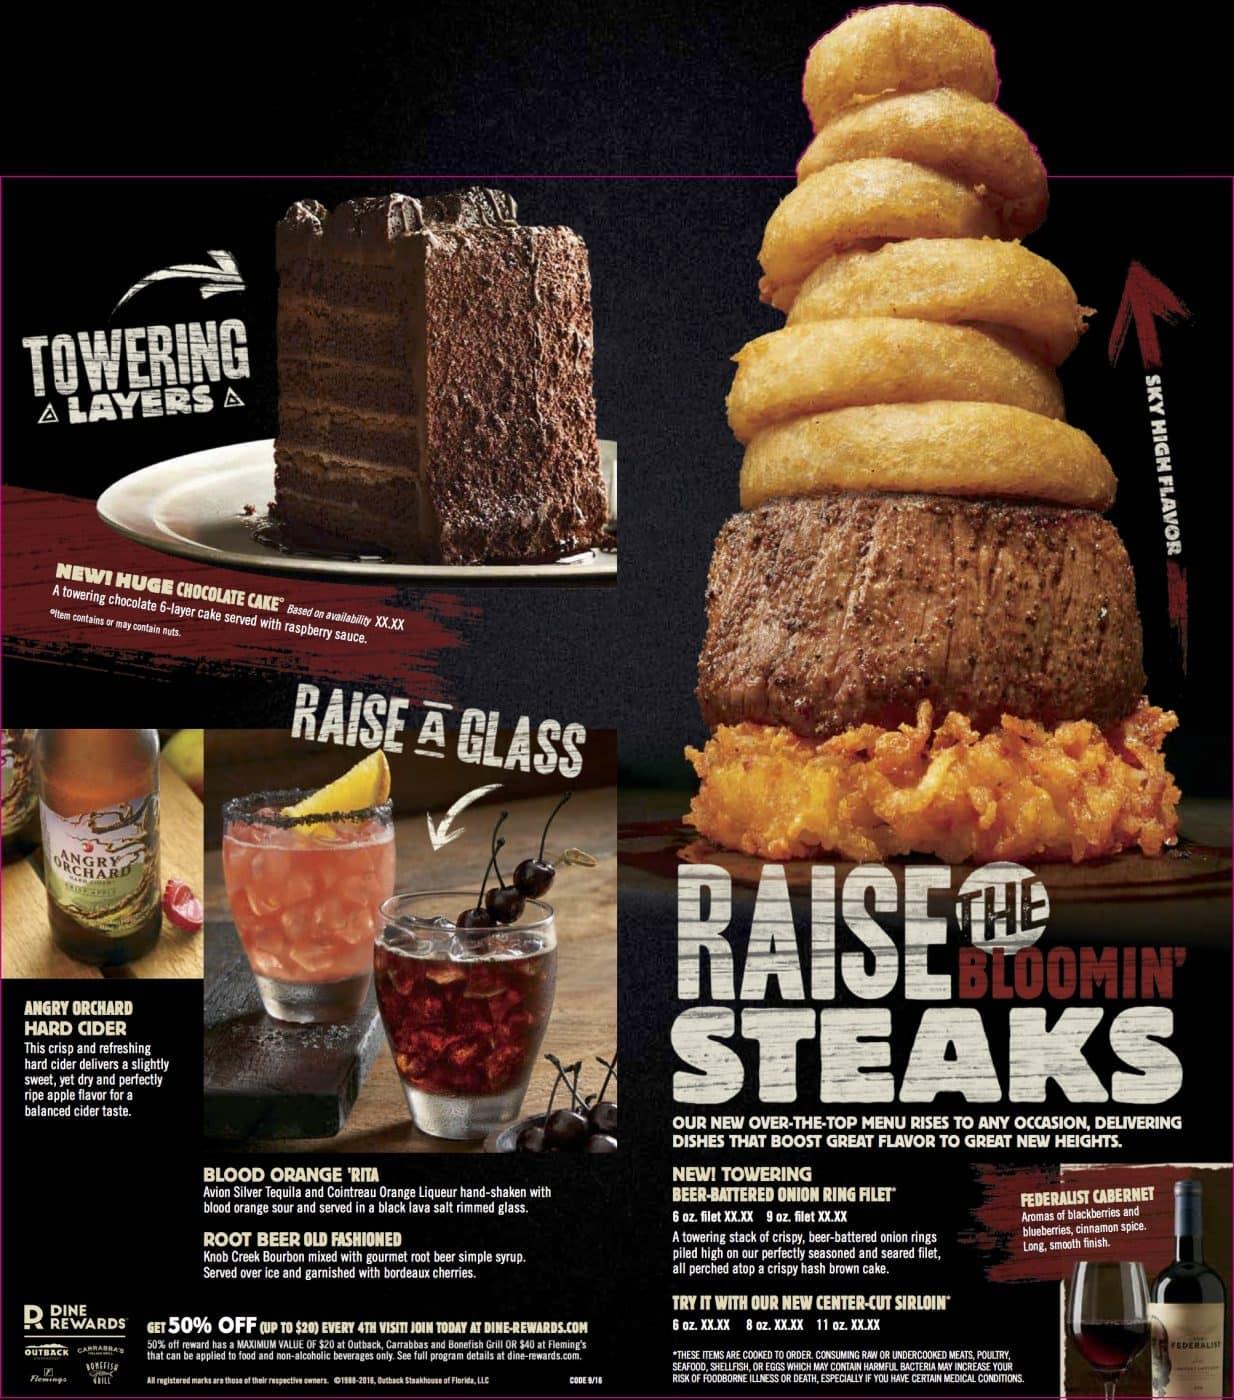 raise-the-steaks-lto16-copy